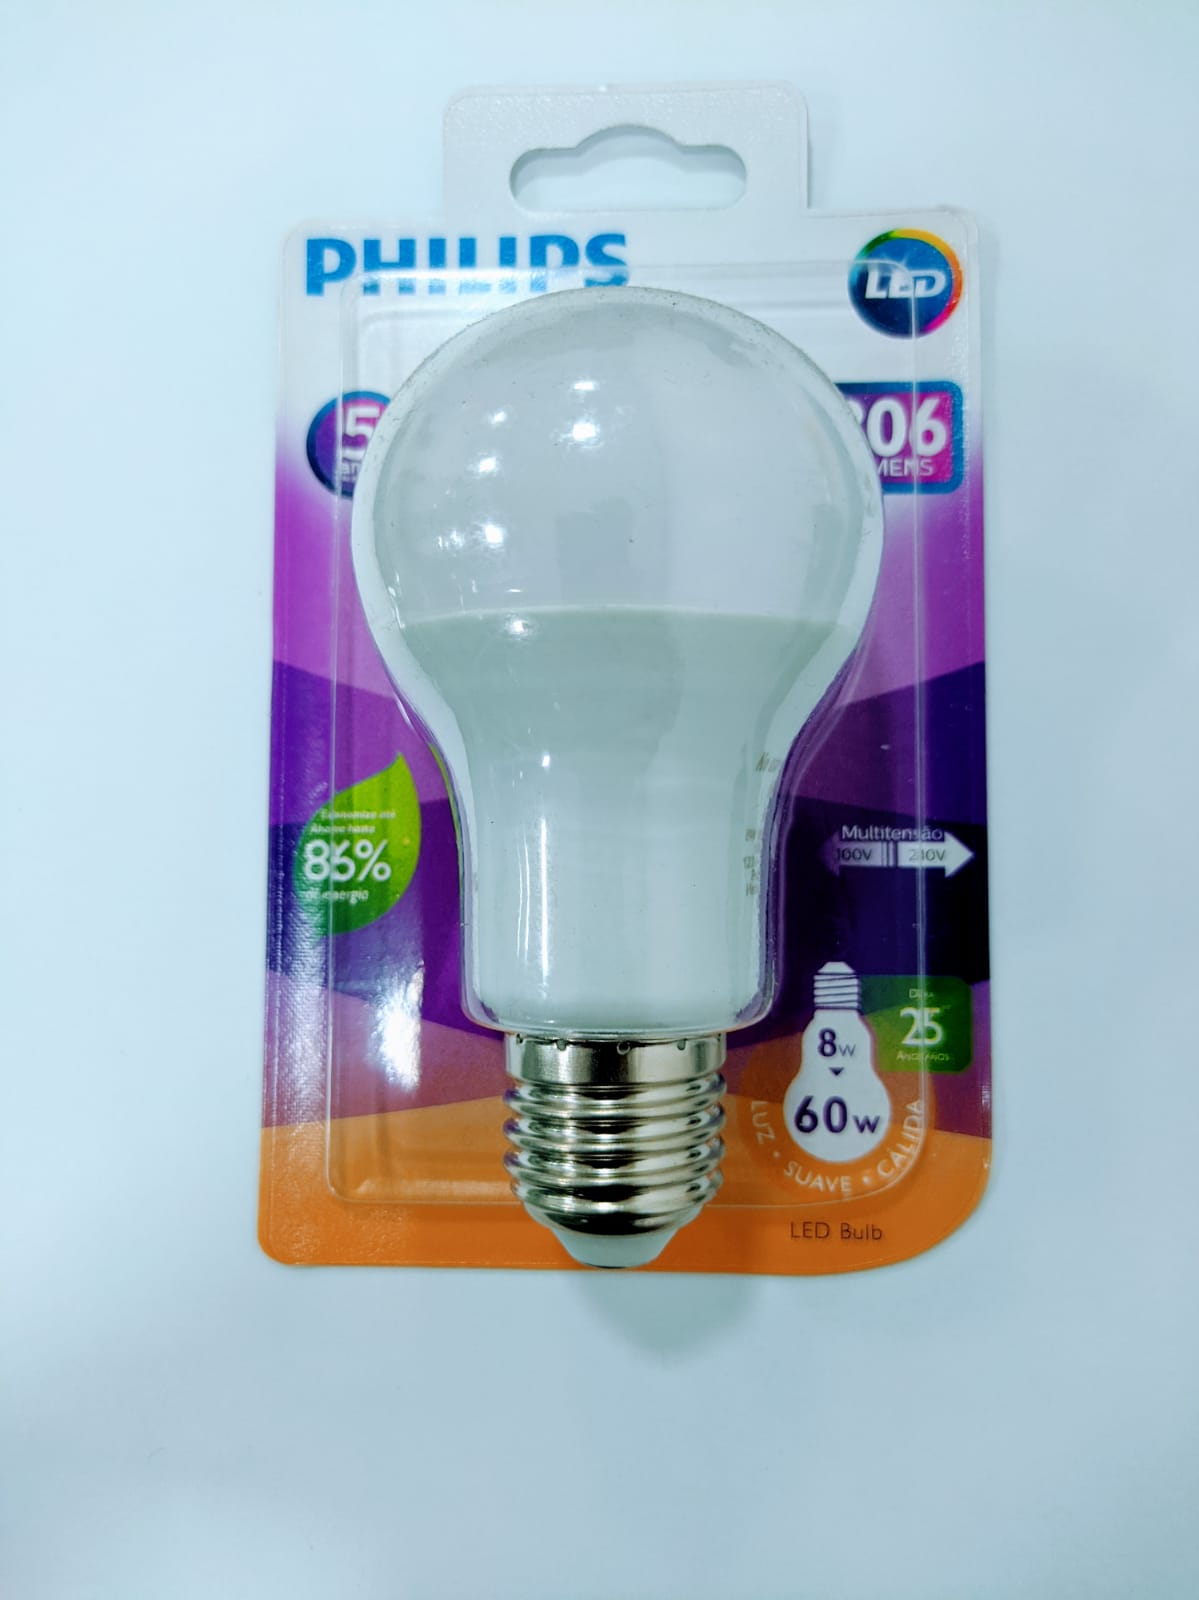 LAMPADA LED PHILIPS BULB 8W-60W 3000K 806LM DT